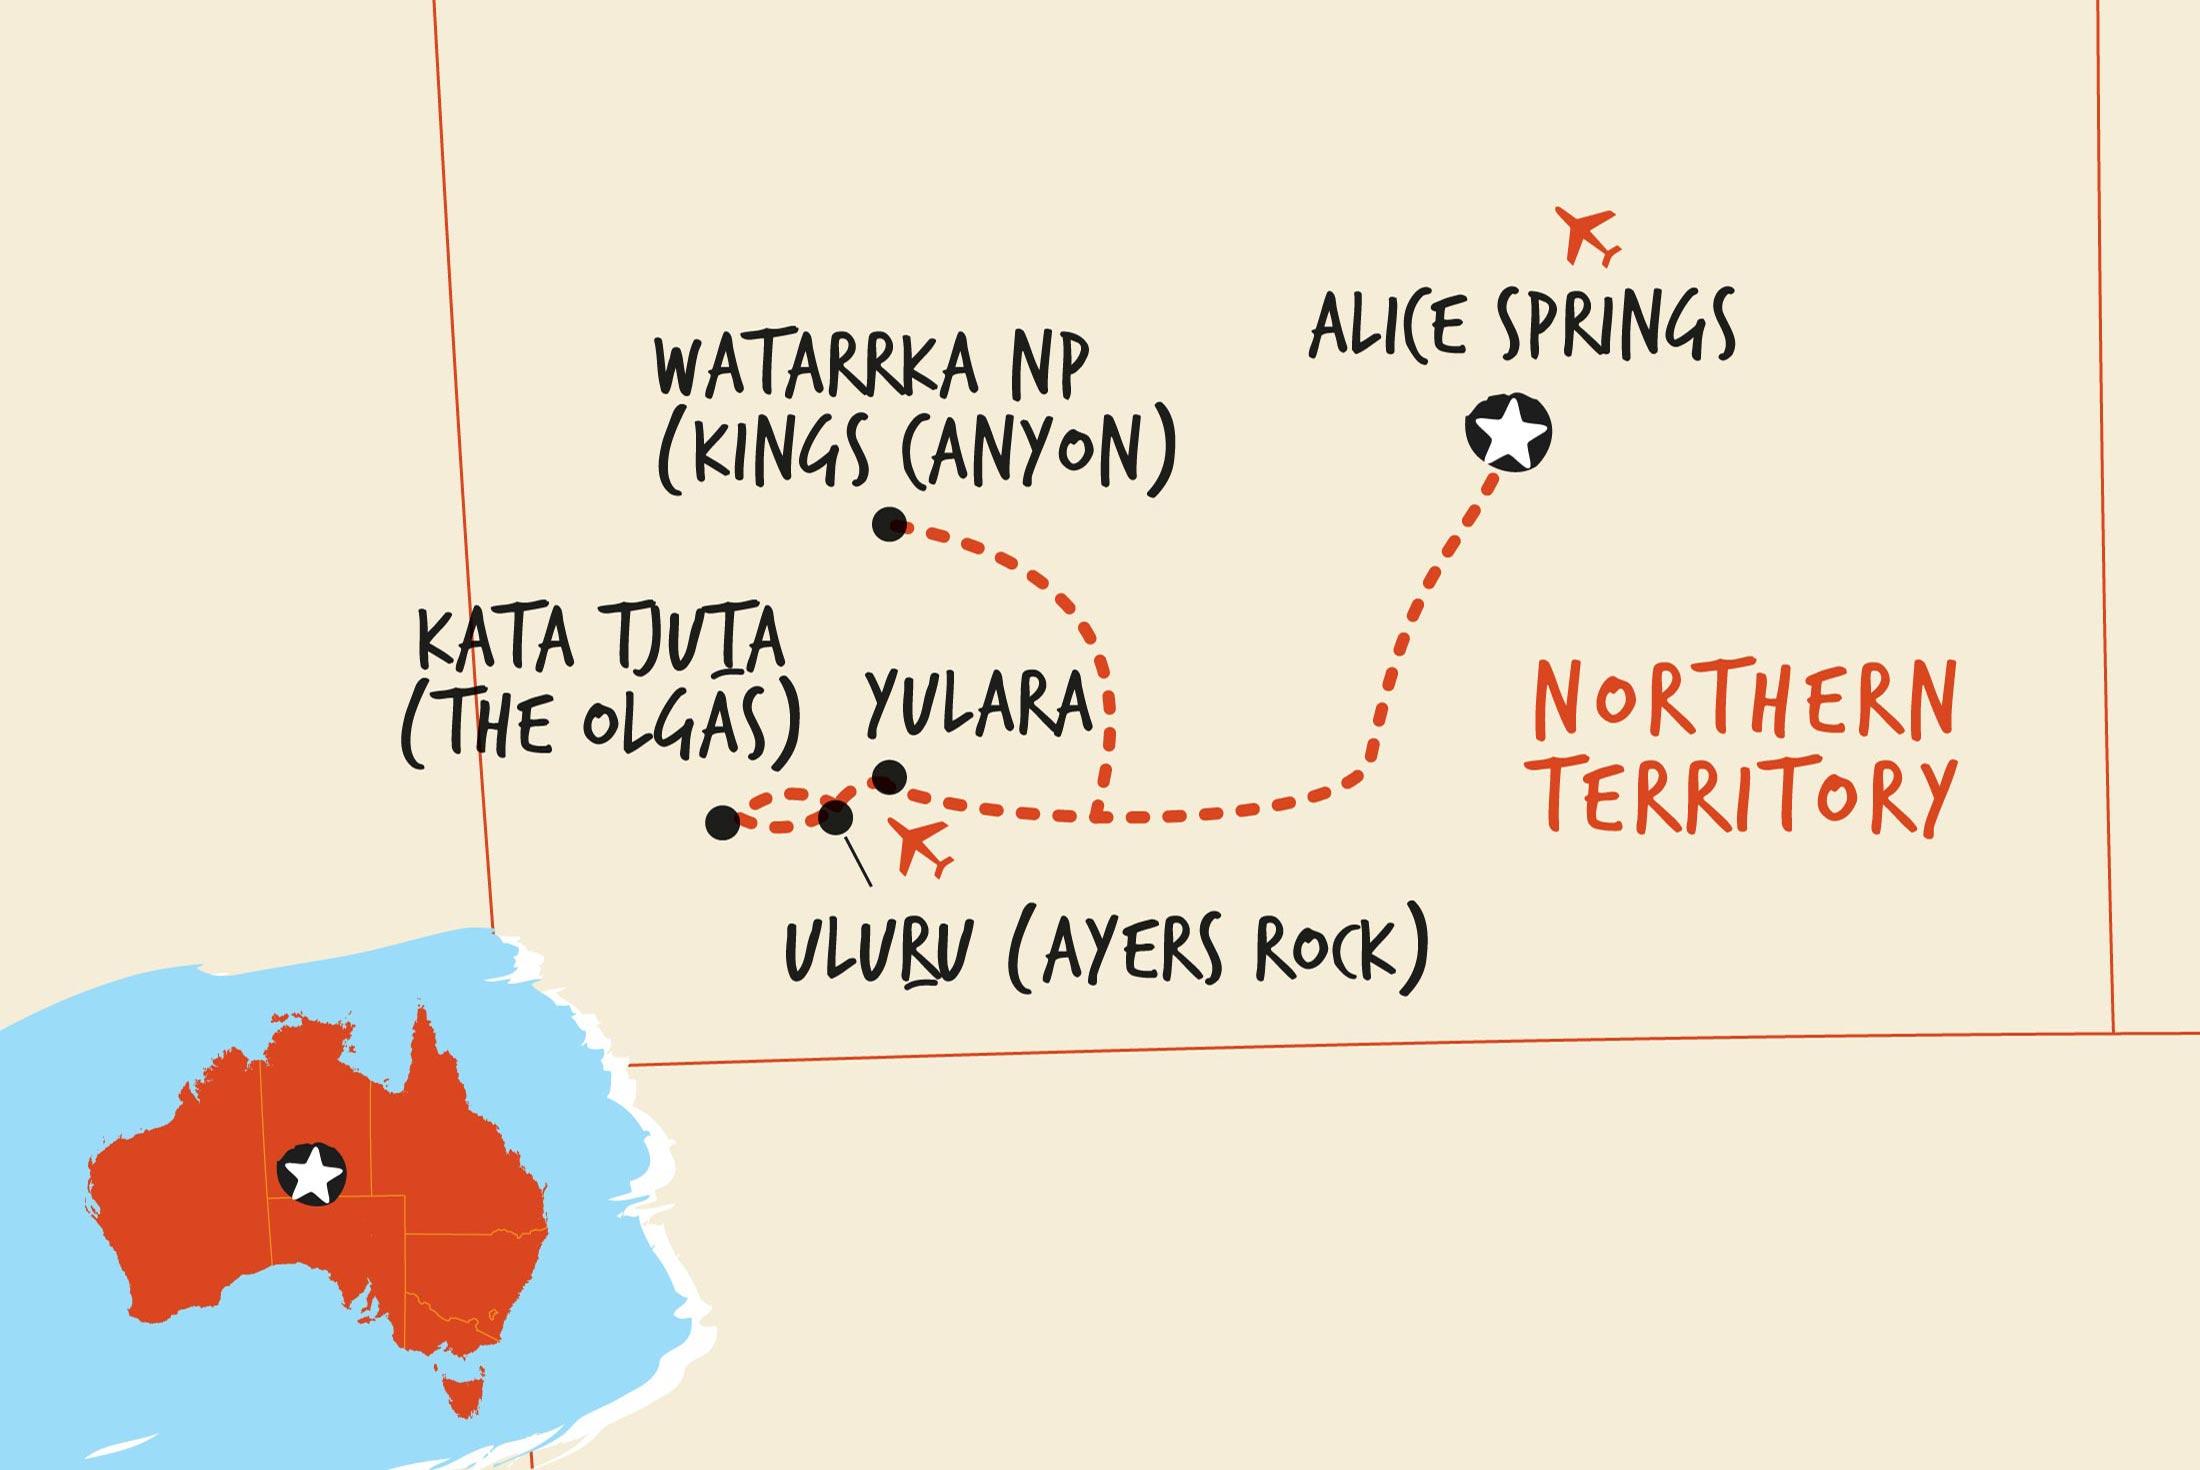 Map of Rock the Centre, Yulara to Yulara including Australia